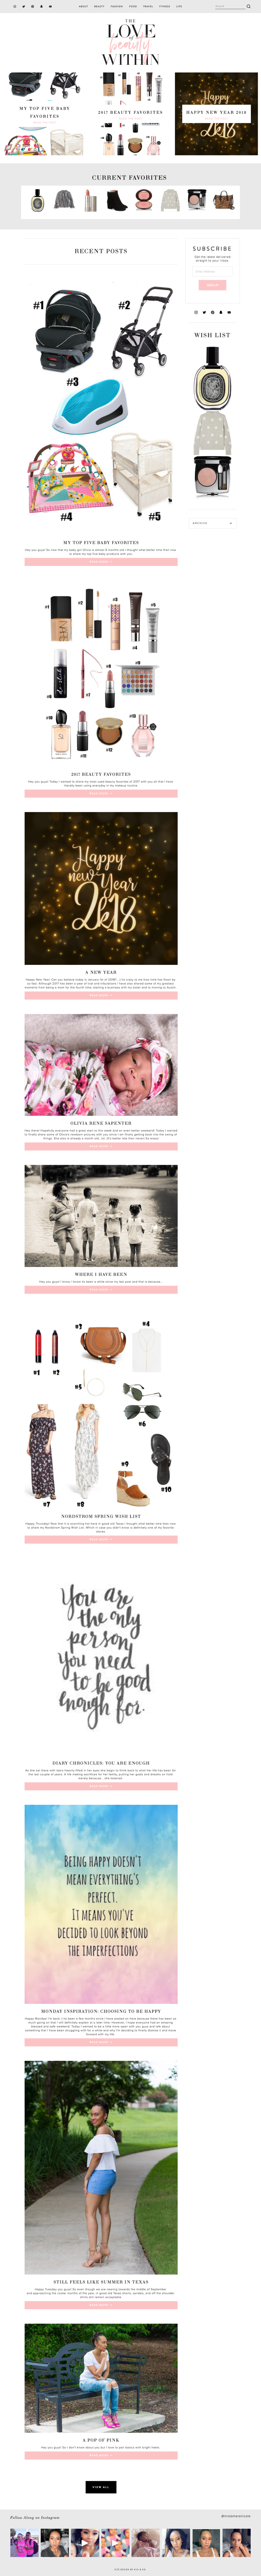 Site & Branding Design by Kiki & Co. Creative